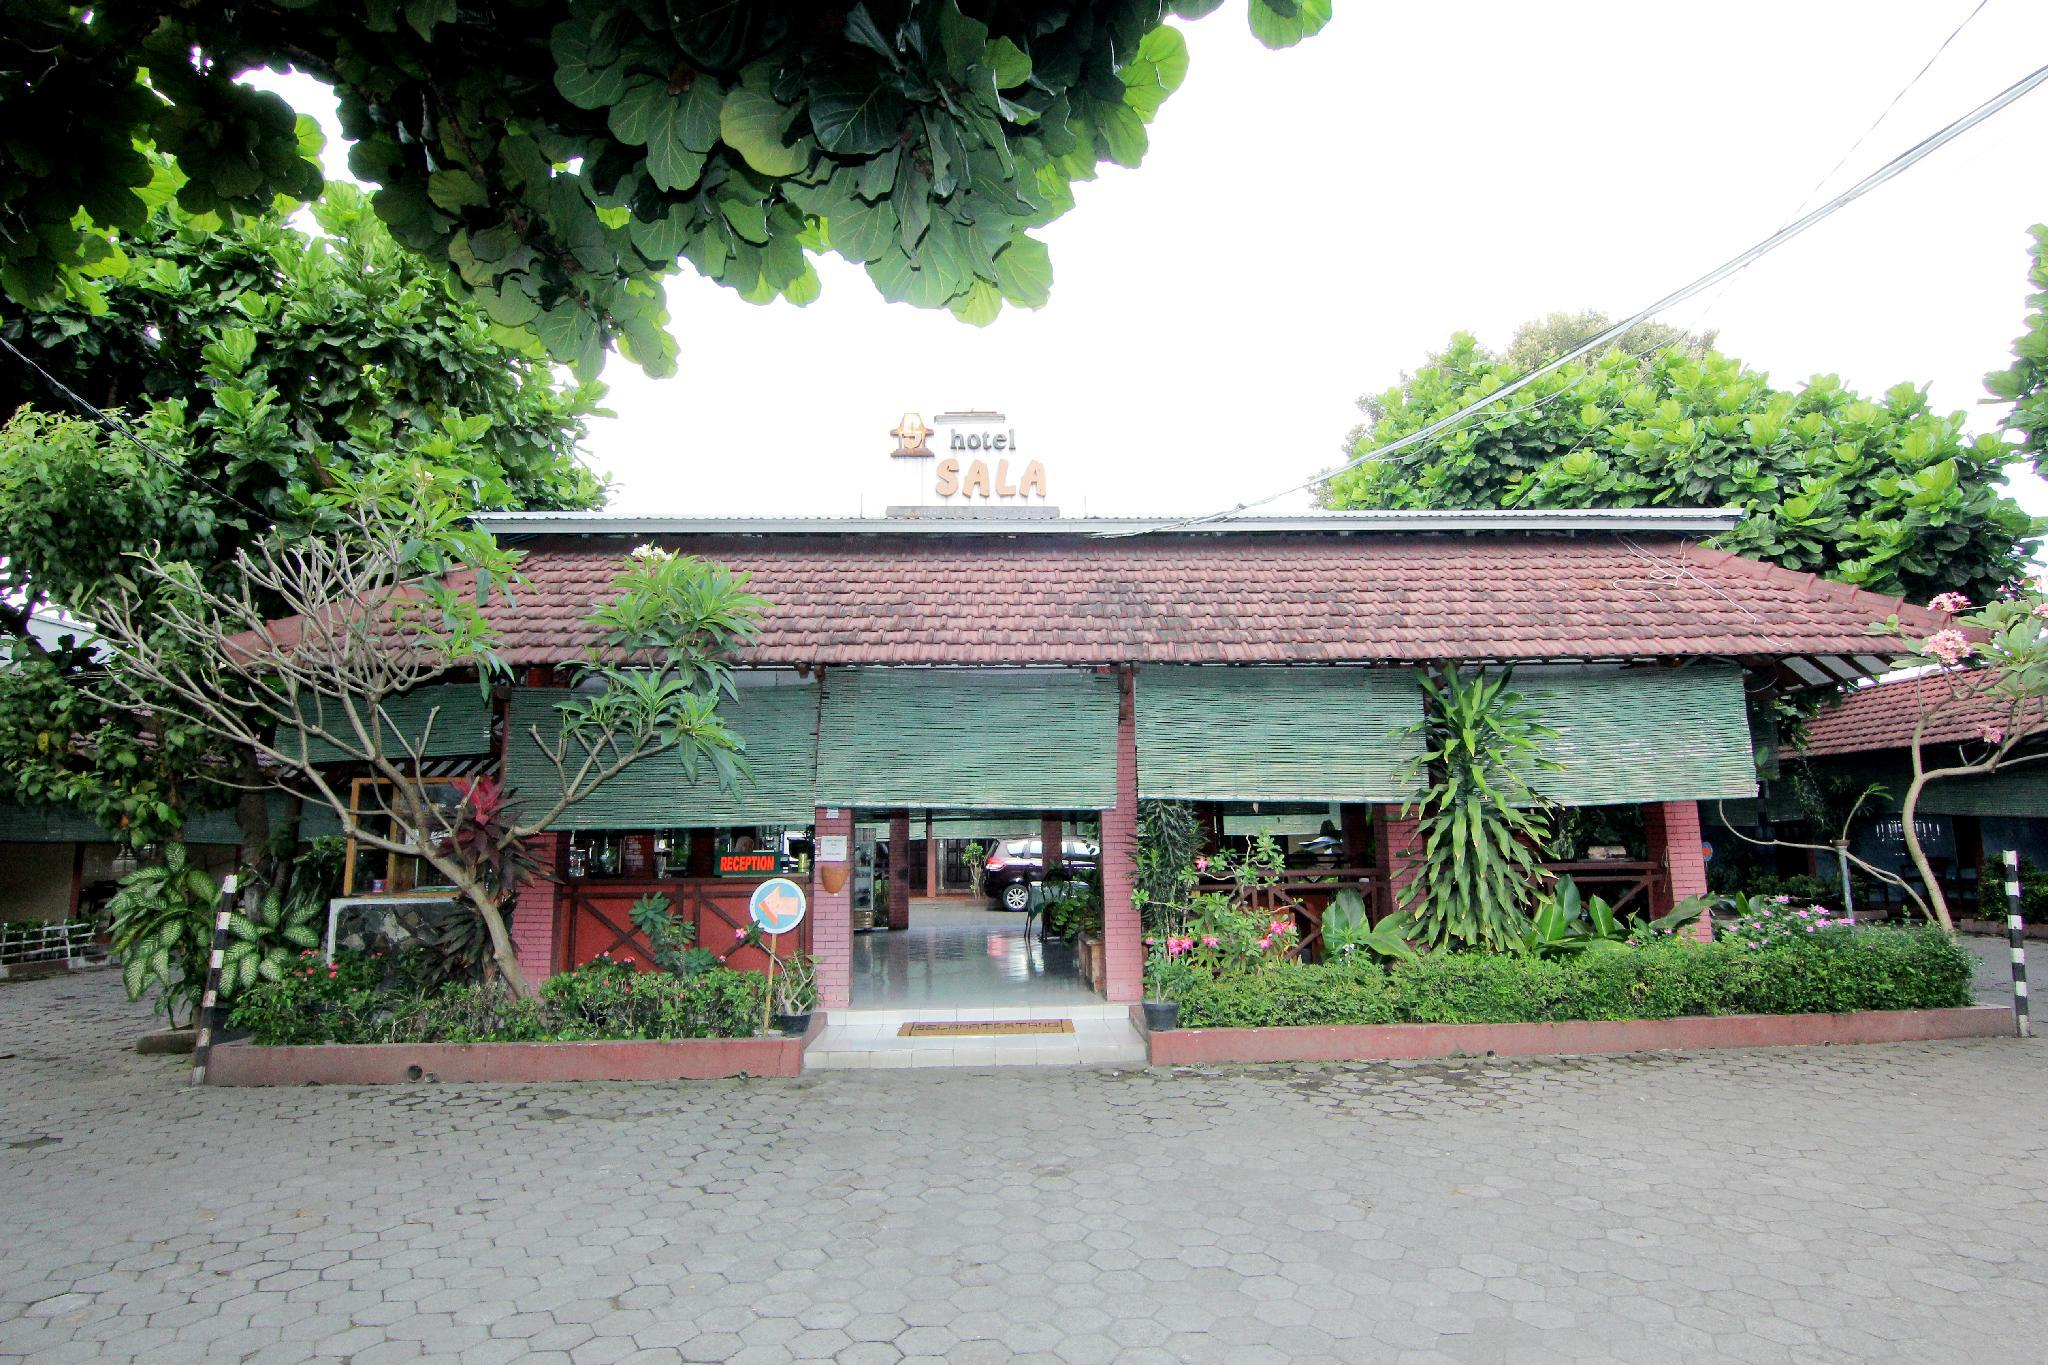 Hotel Sala